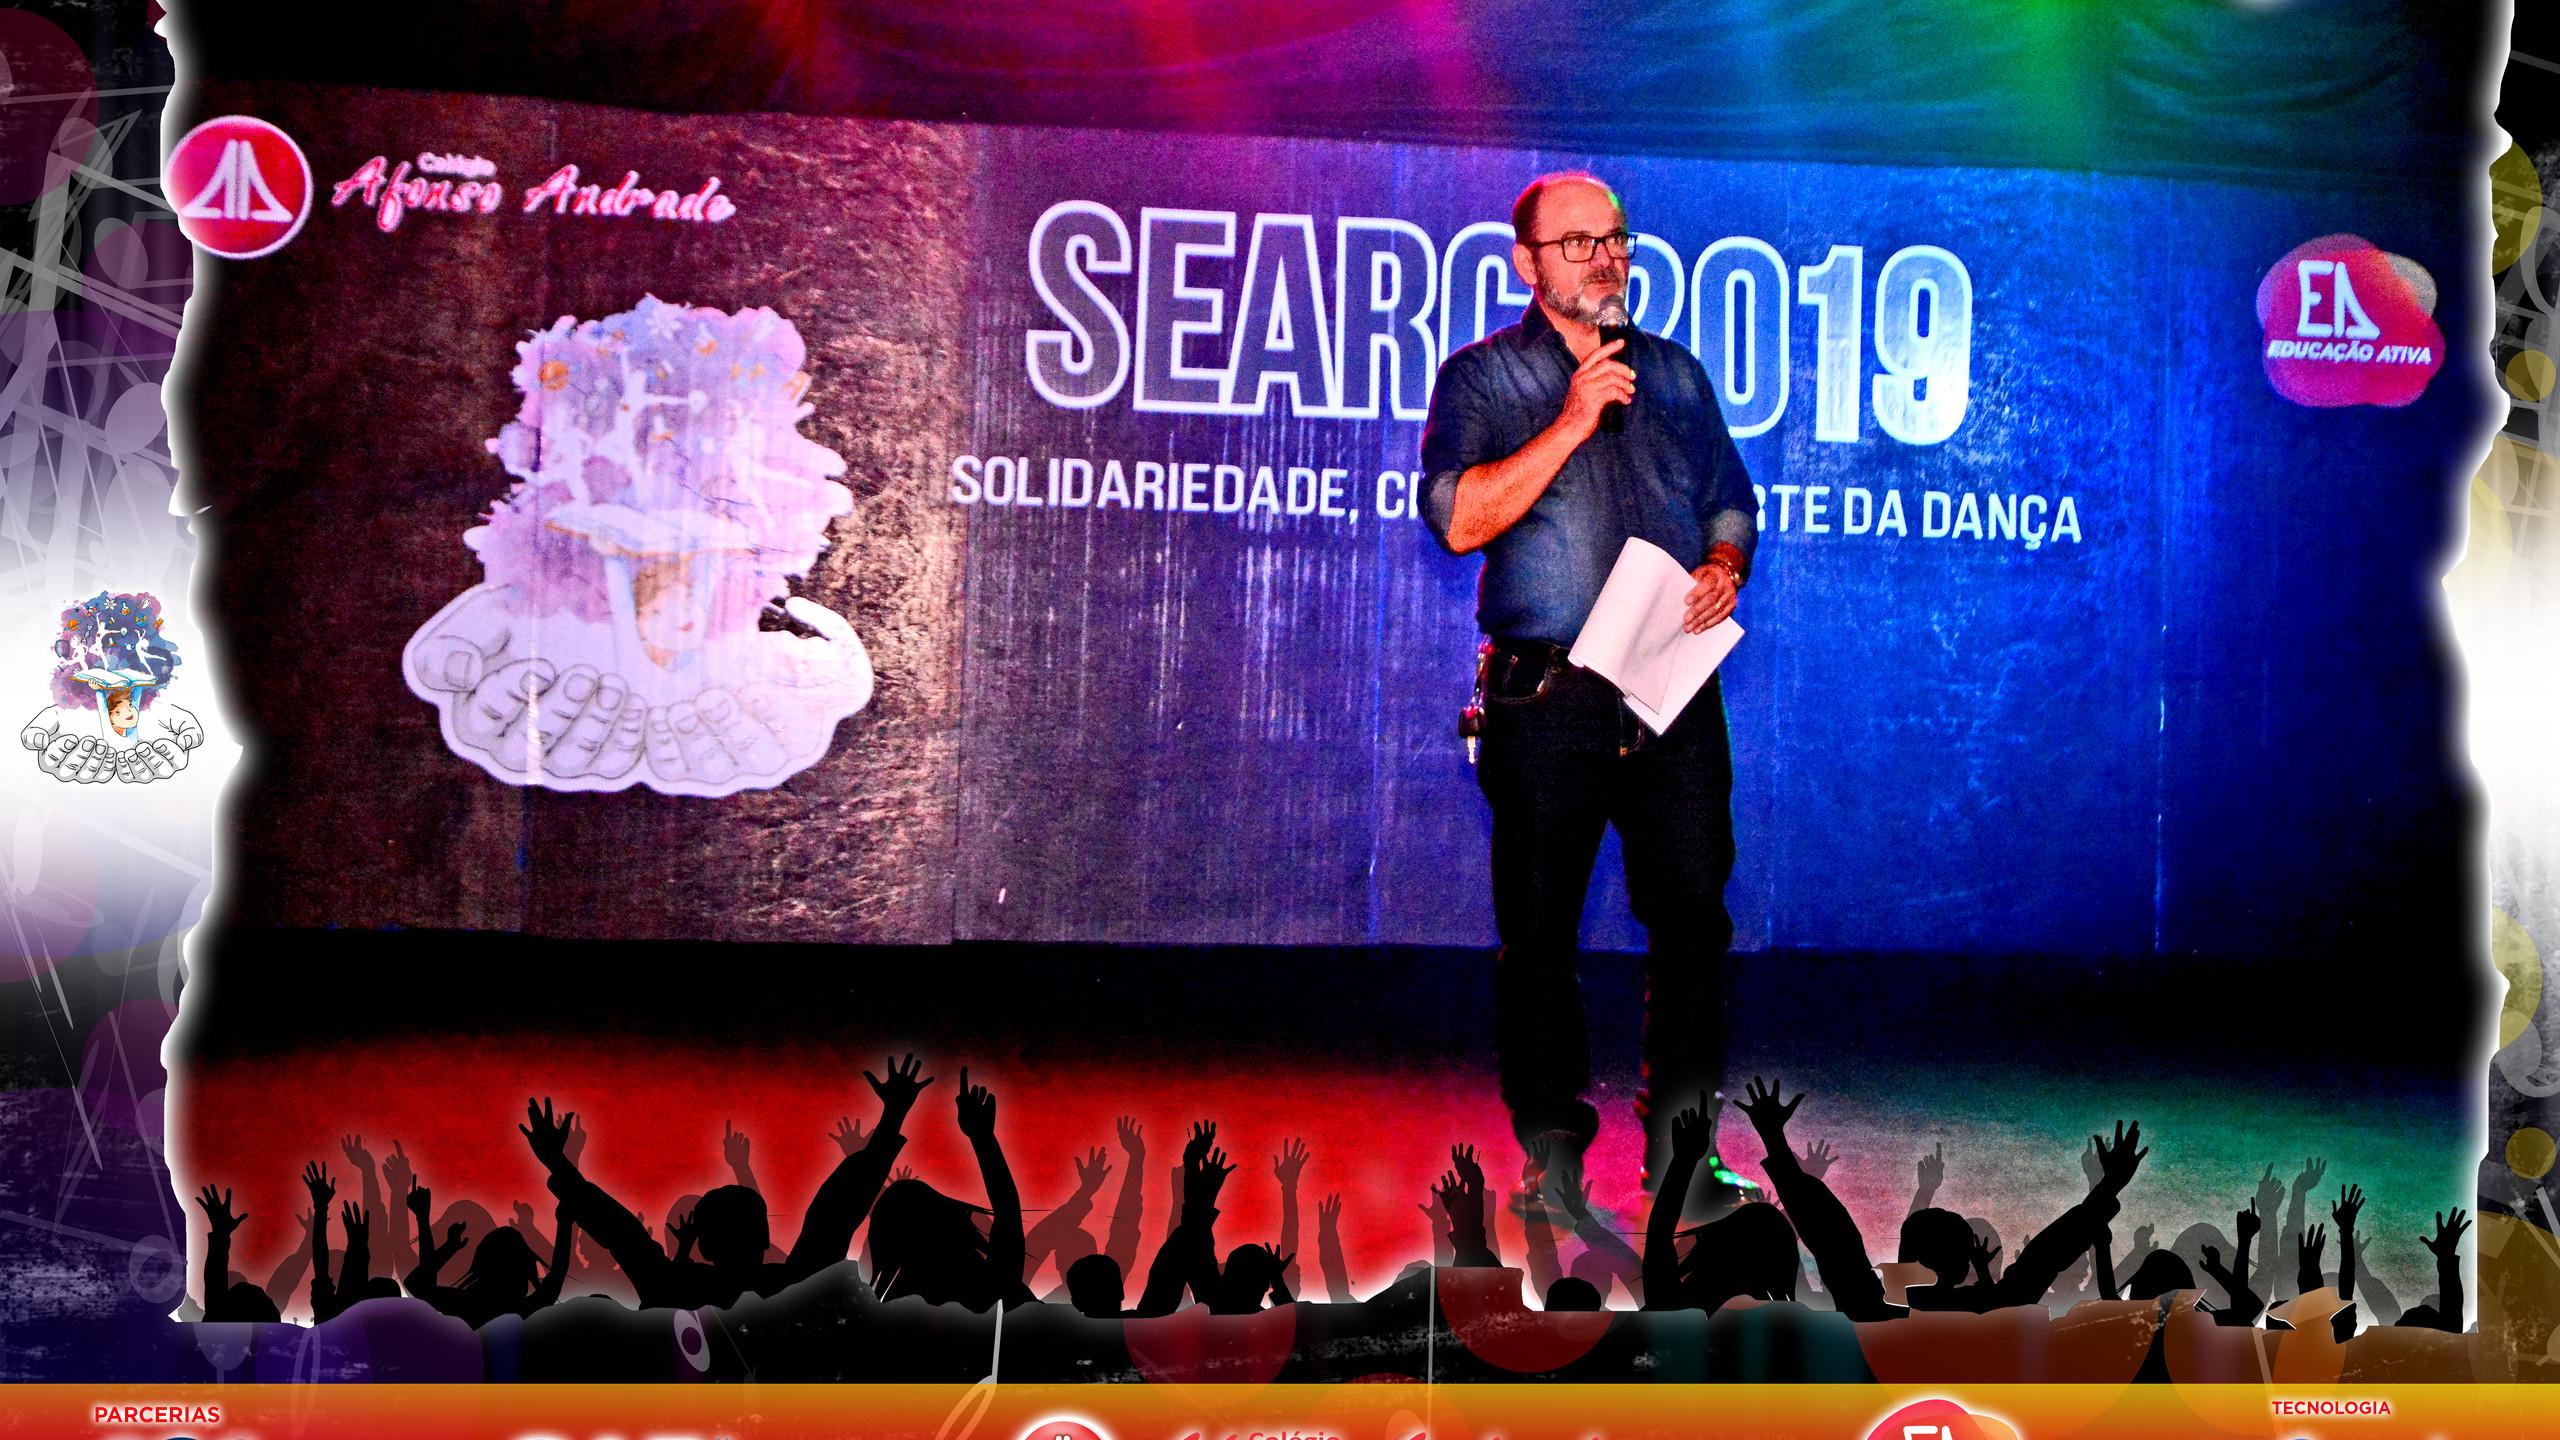 SEARC 2019